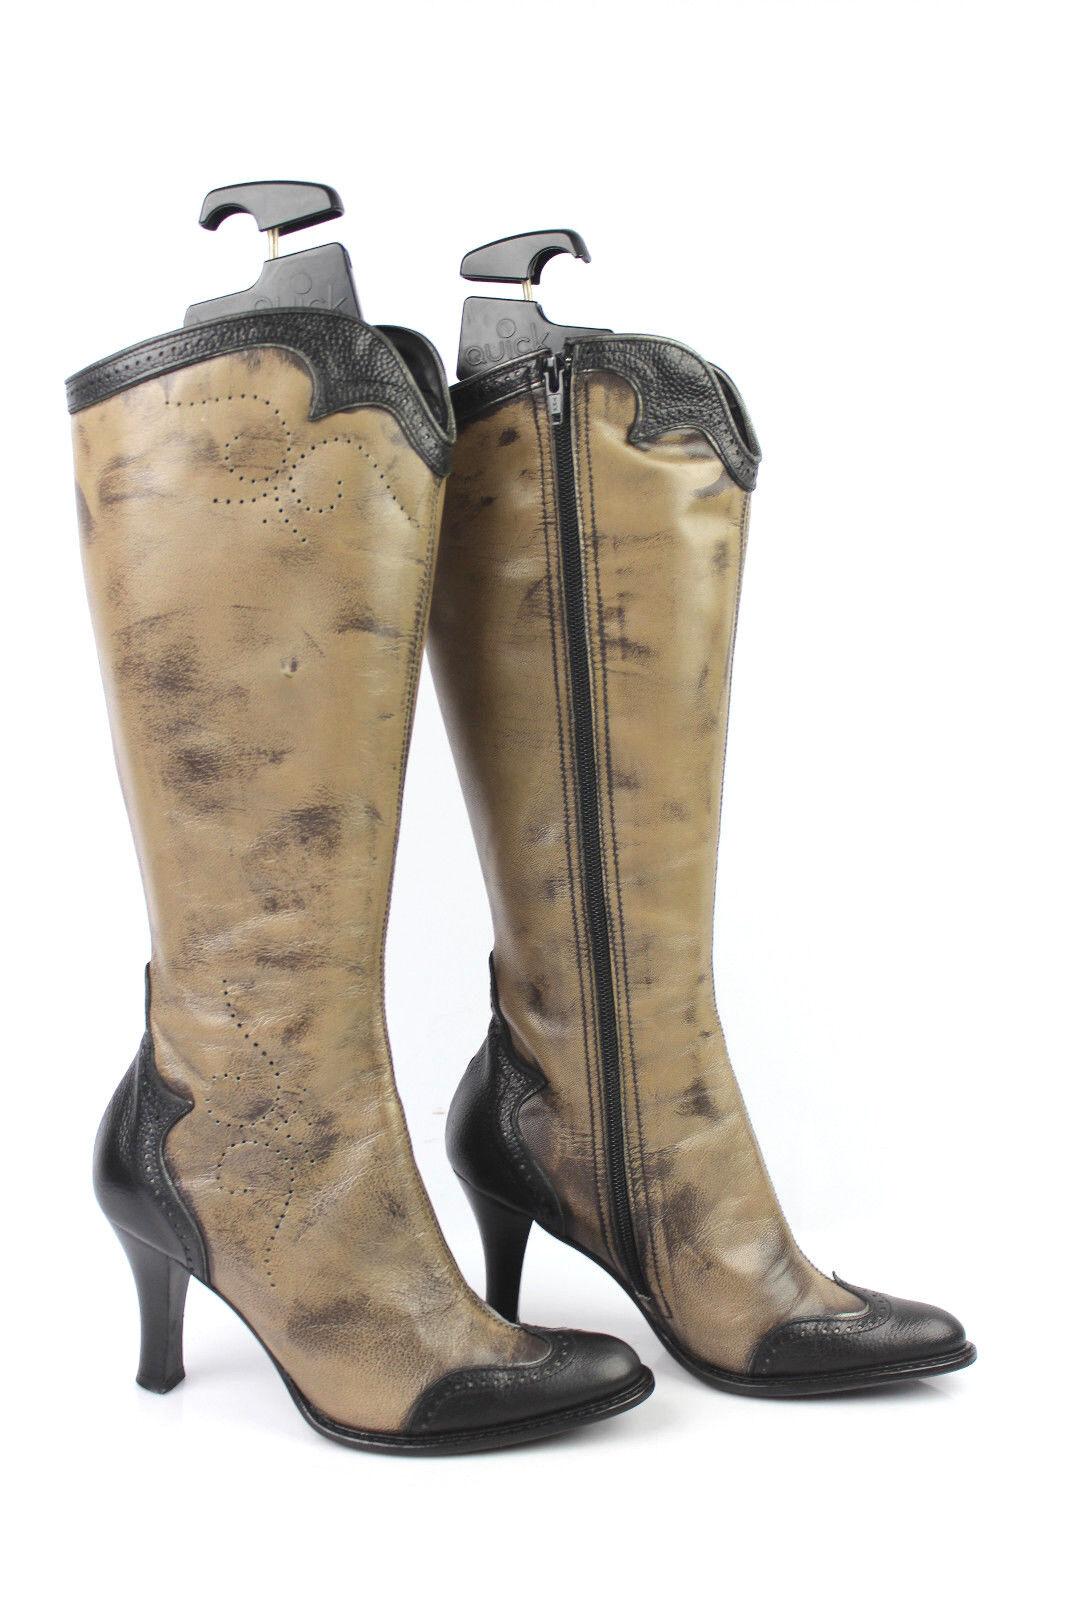 Stiefel SAN MARINA Leder taupe hell nuanciert schwarz t 36   37